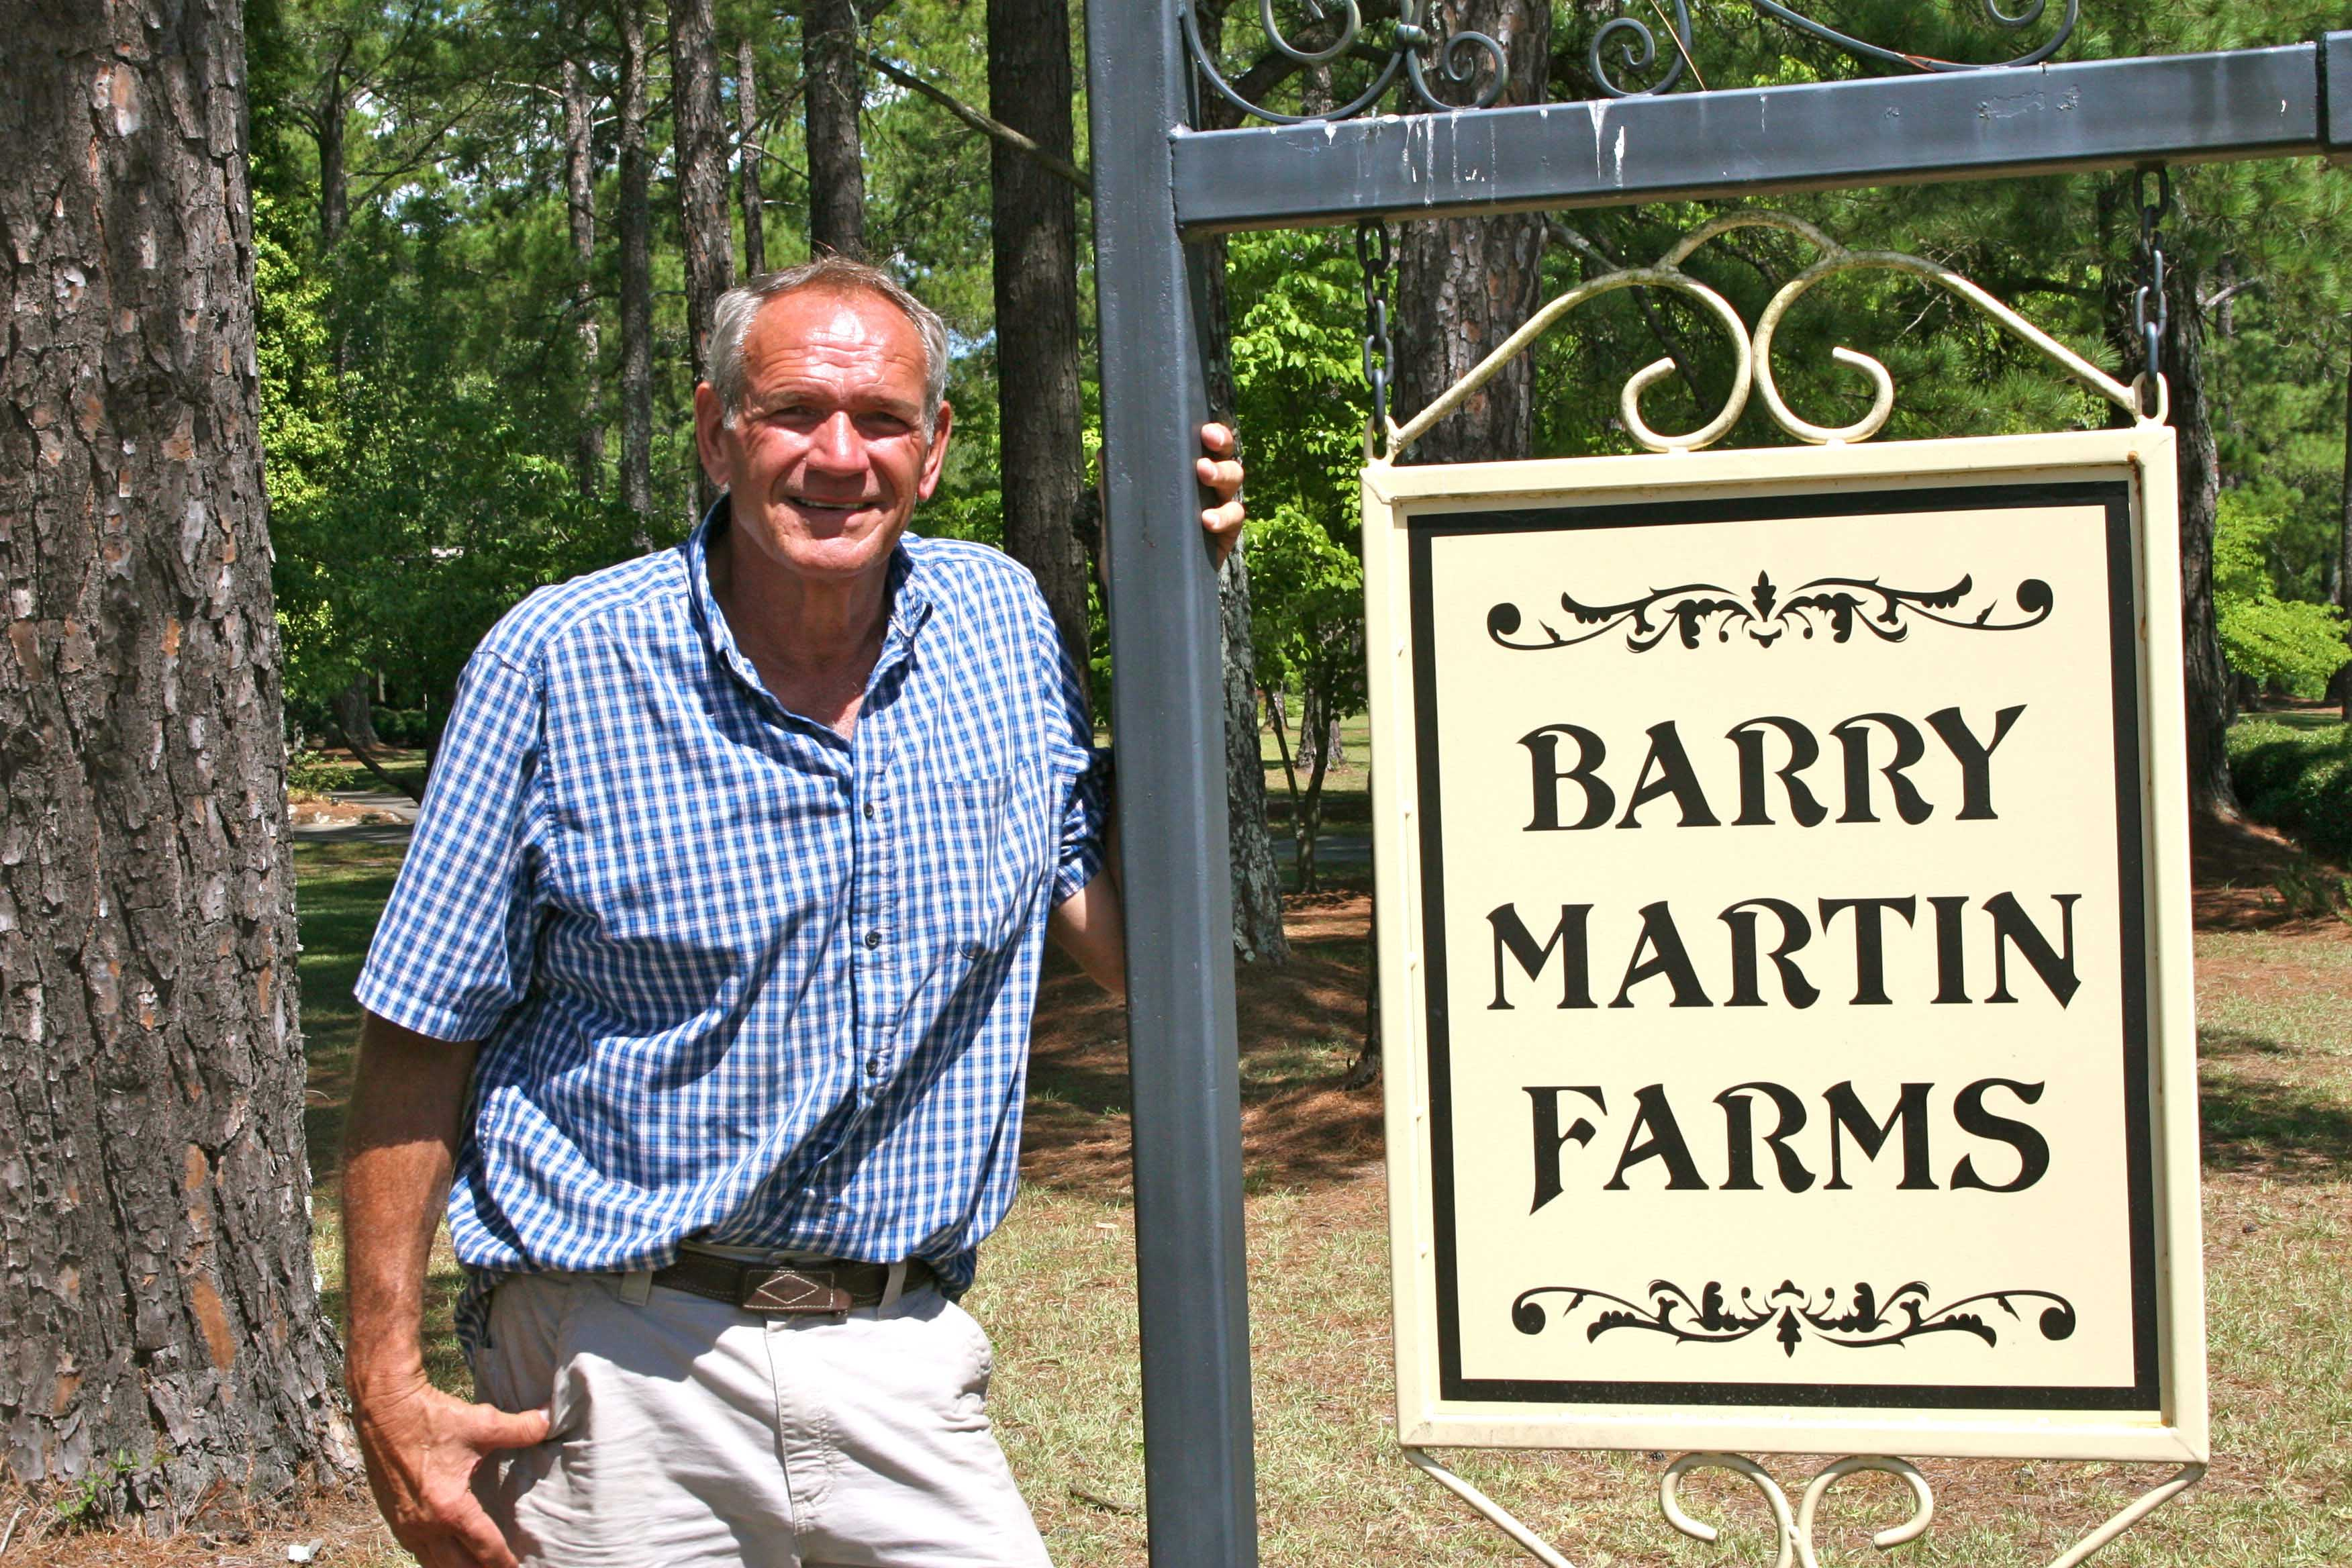 Barry Martin on his farm in Hawkinsville, Ga. Martin is the 2012 Swisher Sweets/Sunbelt Expo Georgia Farmer of the Year.